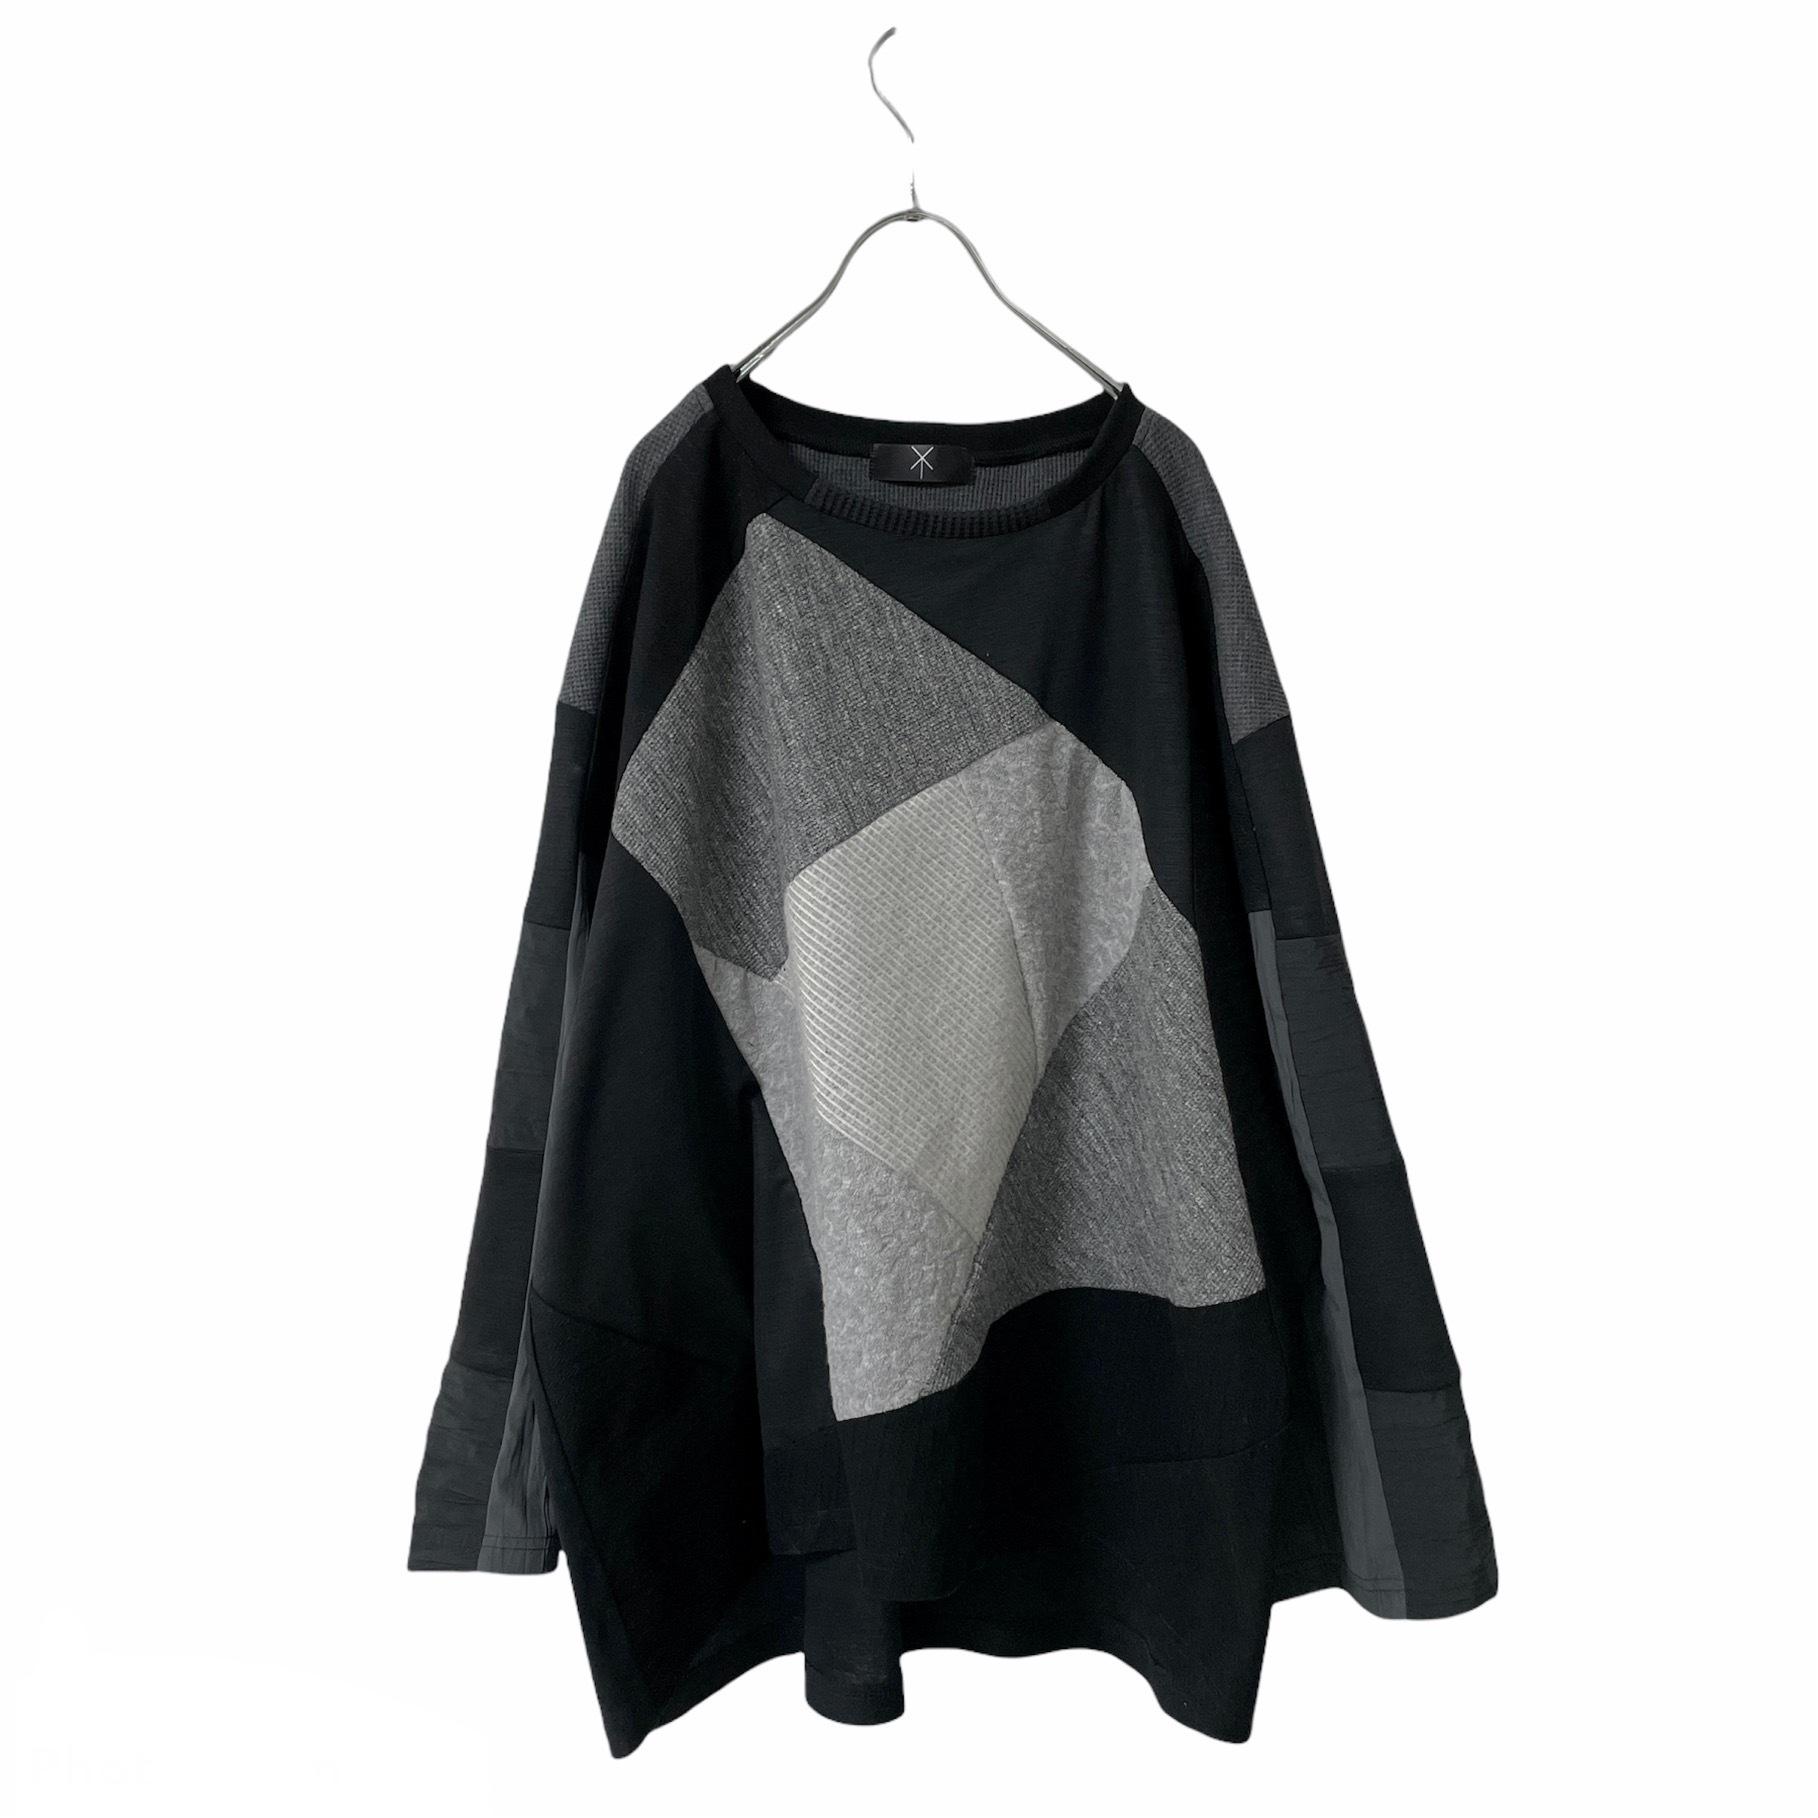 Wide-T-shirts1.1 (black/grey)